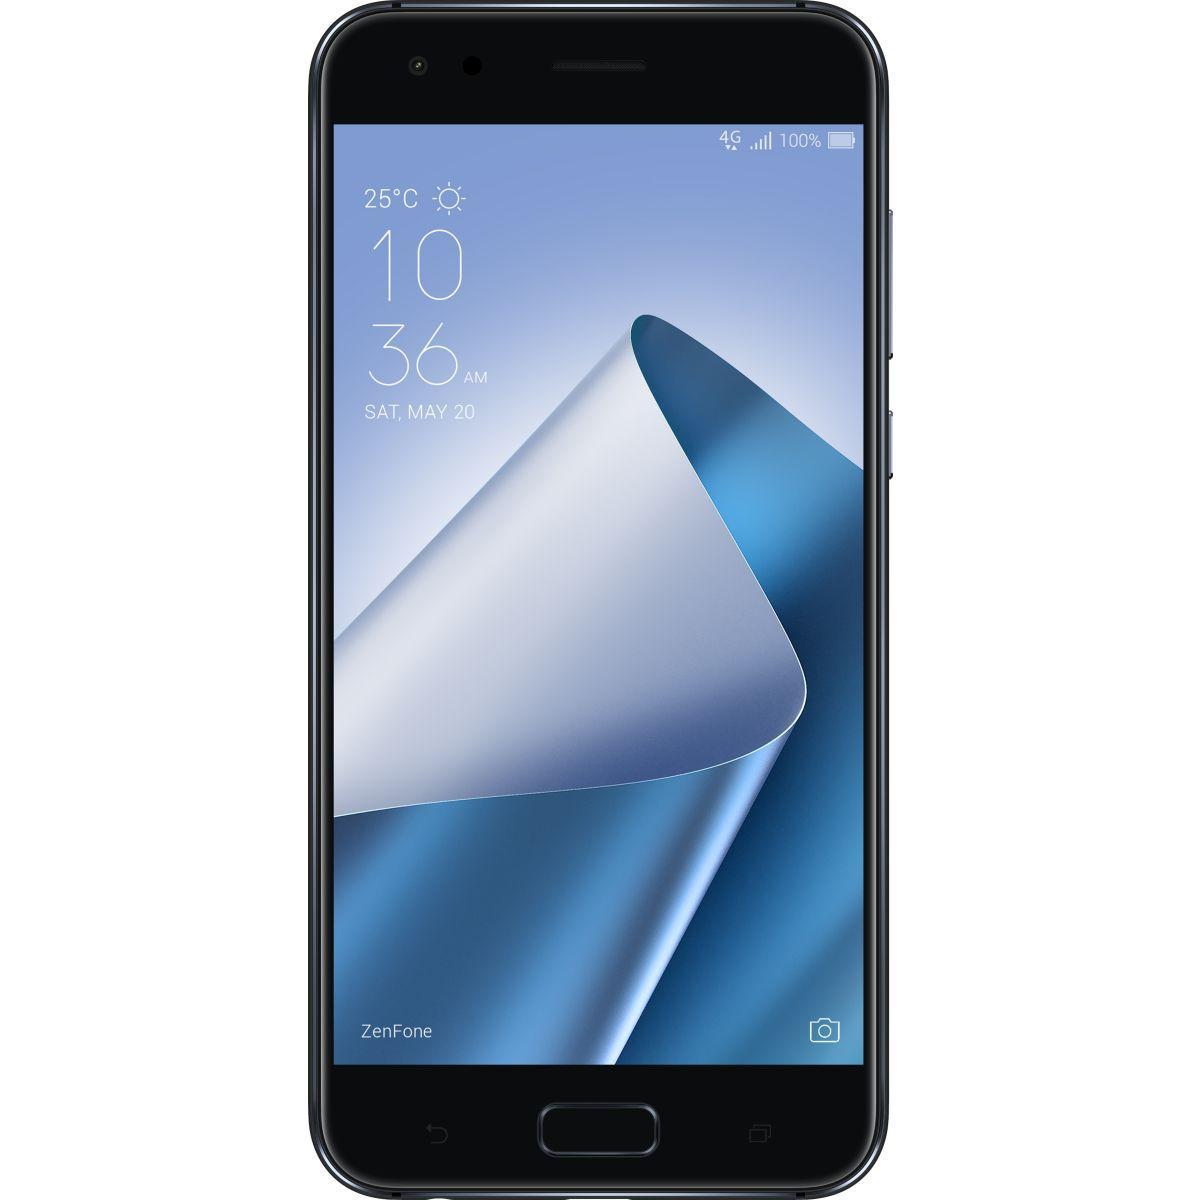 Smartphone asus zenfone 4 ze554kl noir - 2% de remise imm�diate avec le code : green2